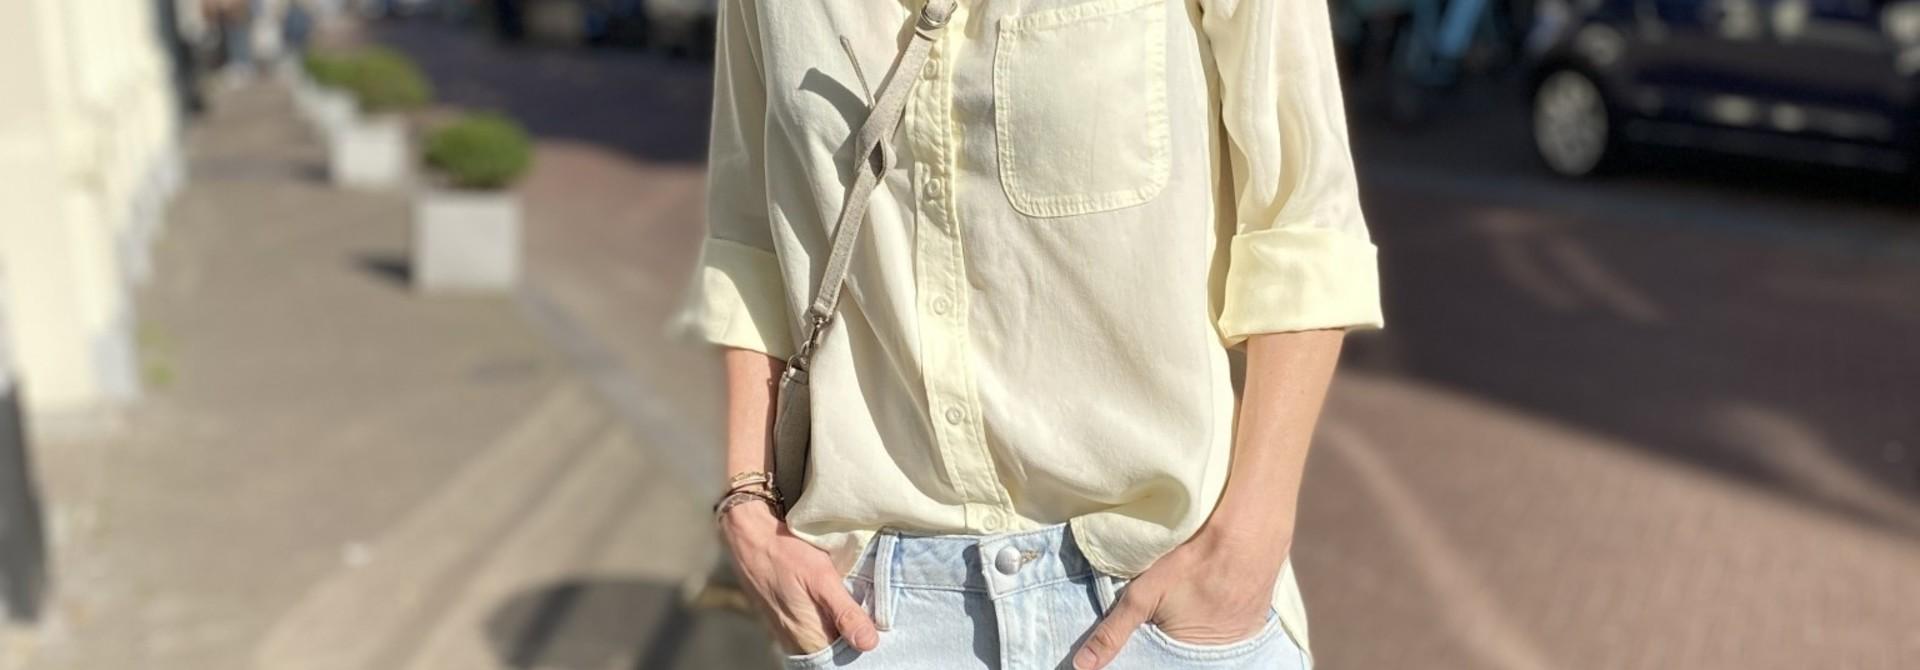 Shirt tail button down